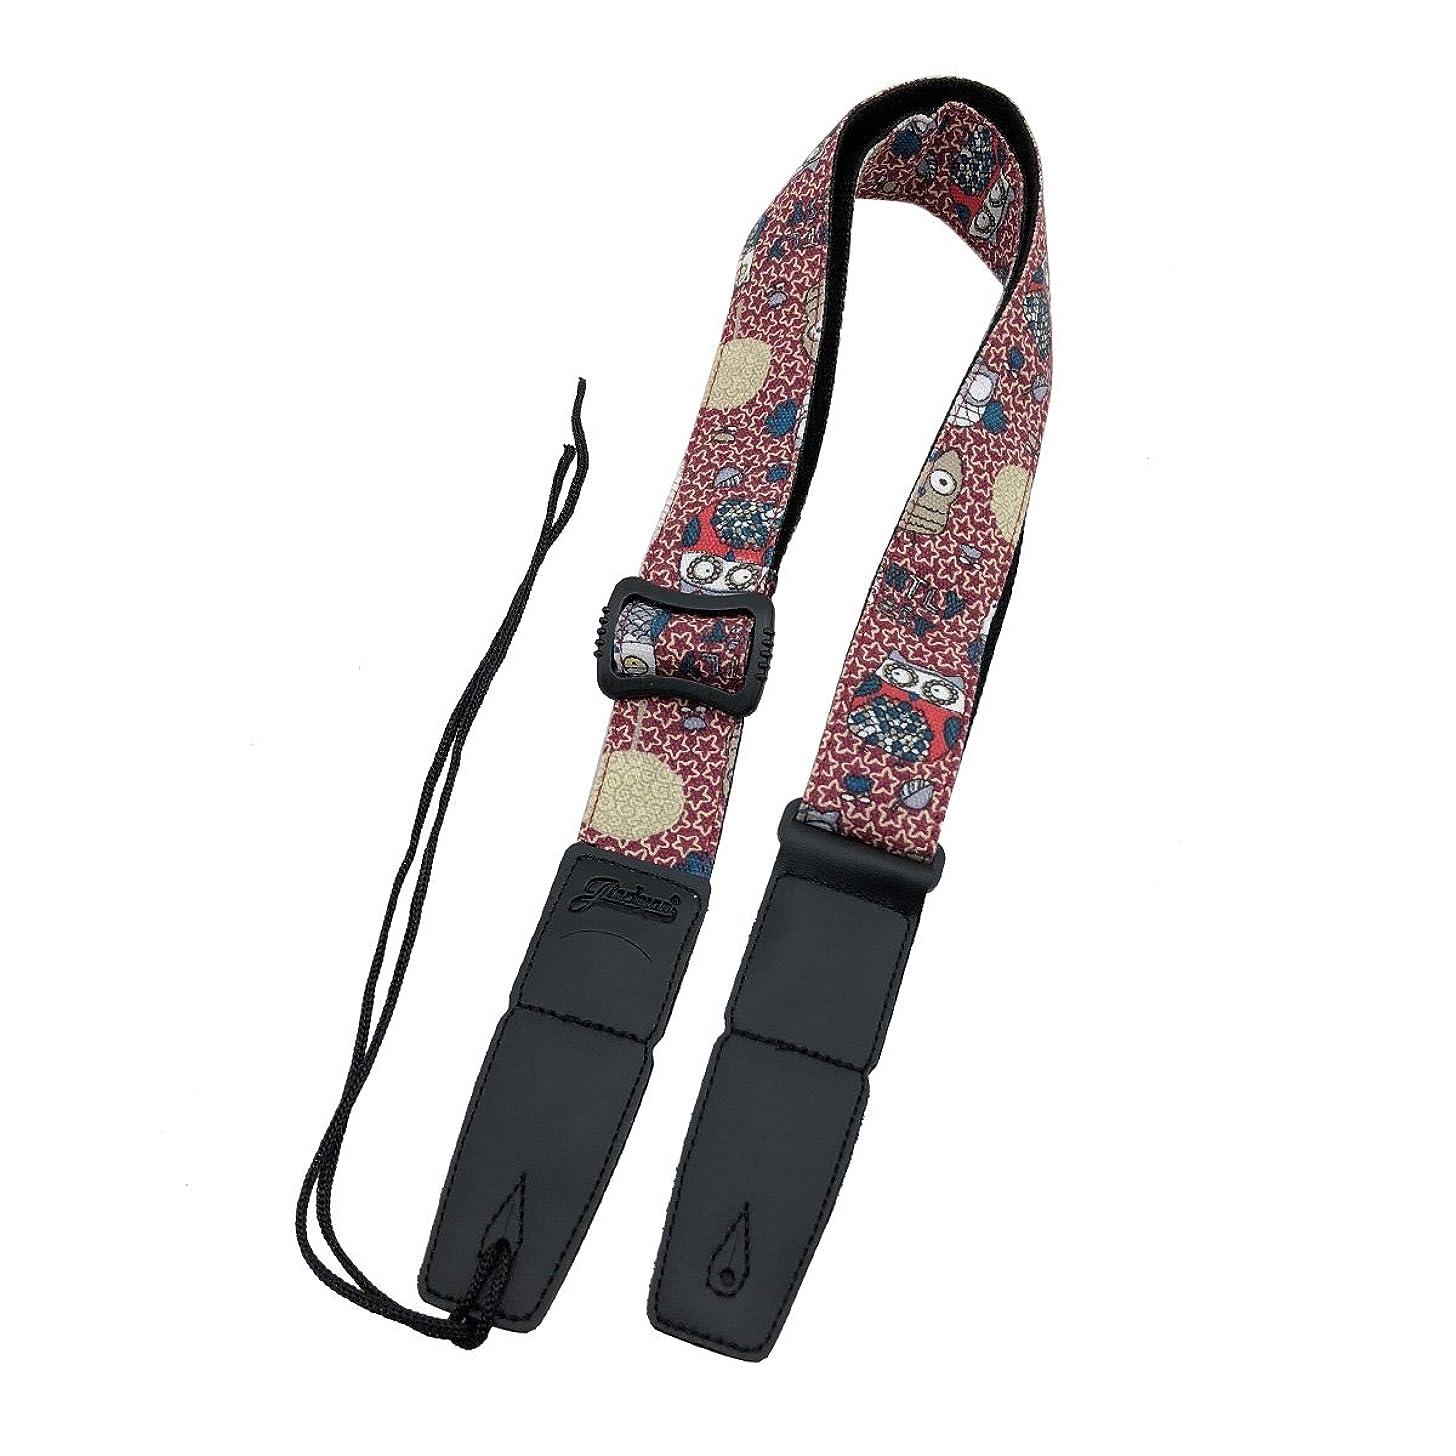 Jiuxun Ukulele Strap Adjustable Shoulder Soft Cotton Linen and Genuine Leather Multifunctional Straps (Red Owl)